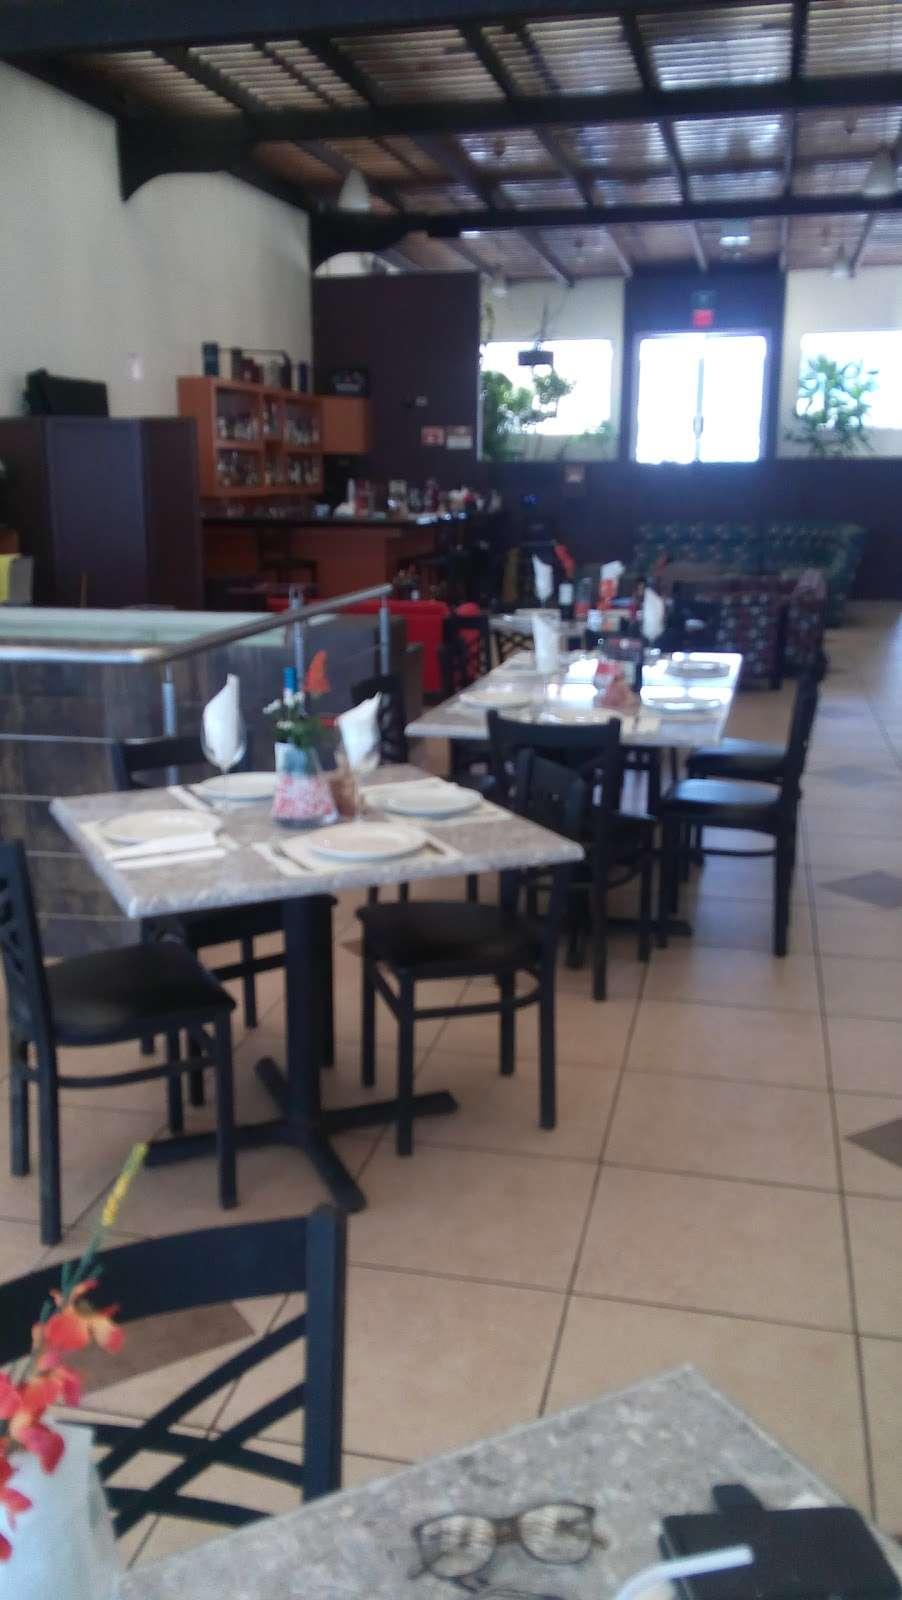 Tattoo Bar Playas - restaurant  | Photo 5 of 10 | Address: Paseo Costero 780-A Malecon,, Sección Monumental, Playas de Tijuana, 22504 Tijuana, B.C., Mexico | Phone: 664 648 4675